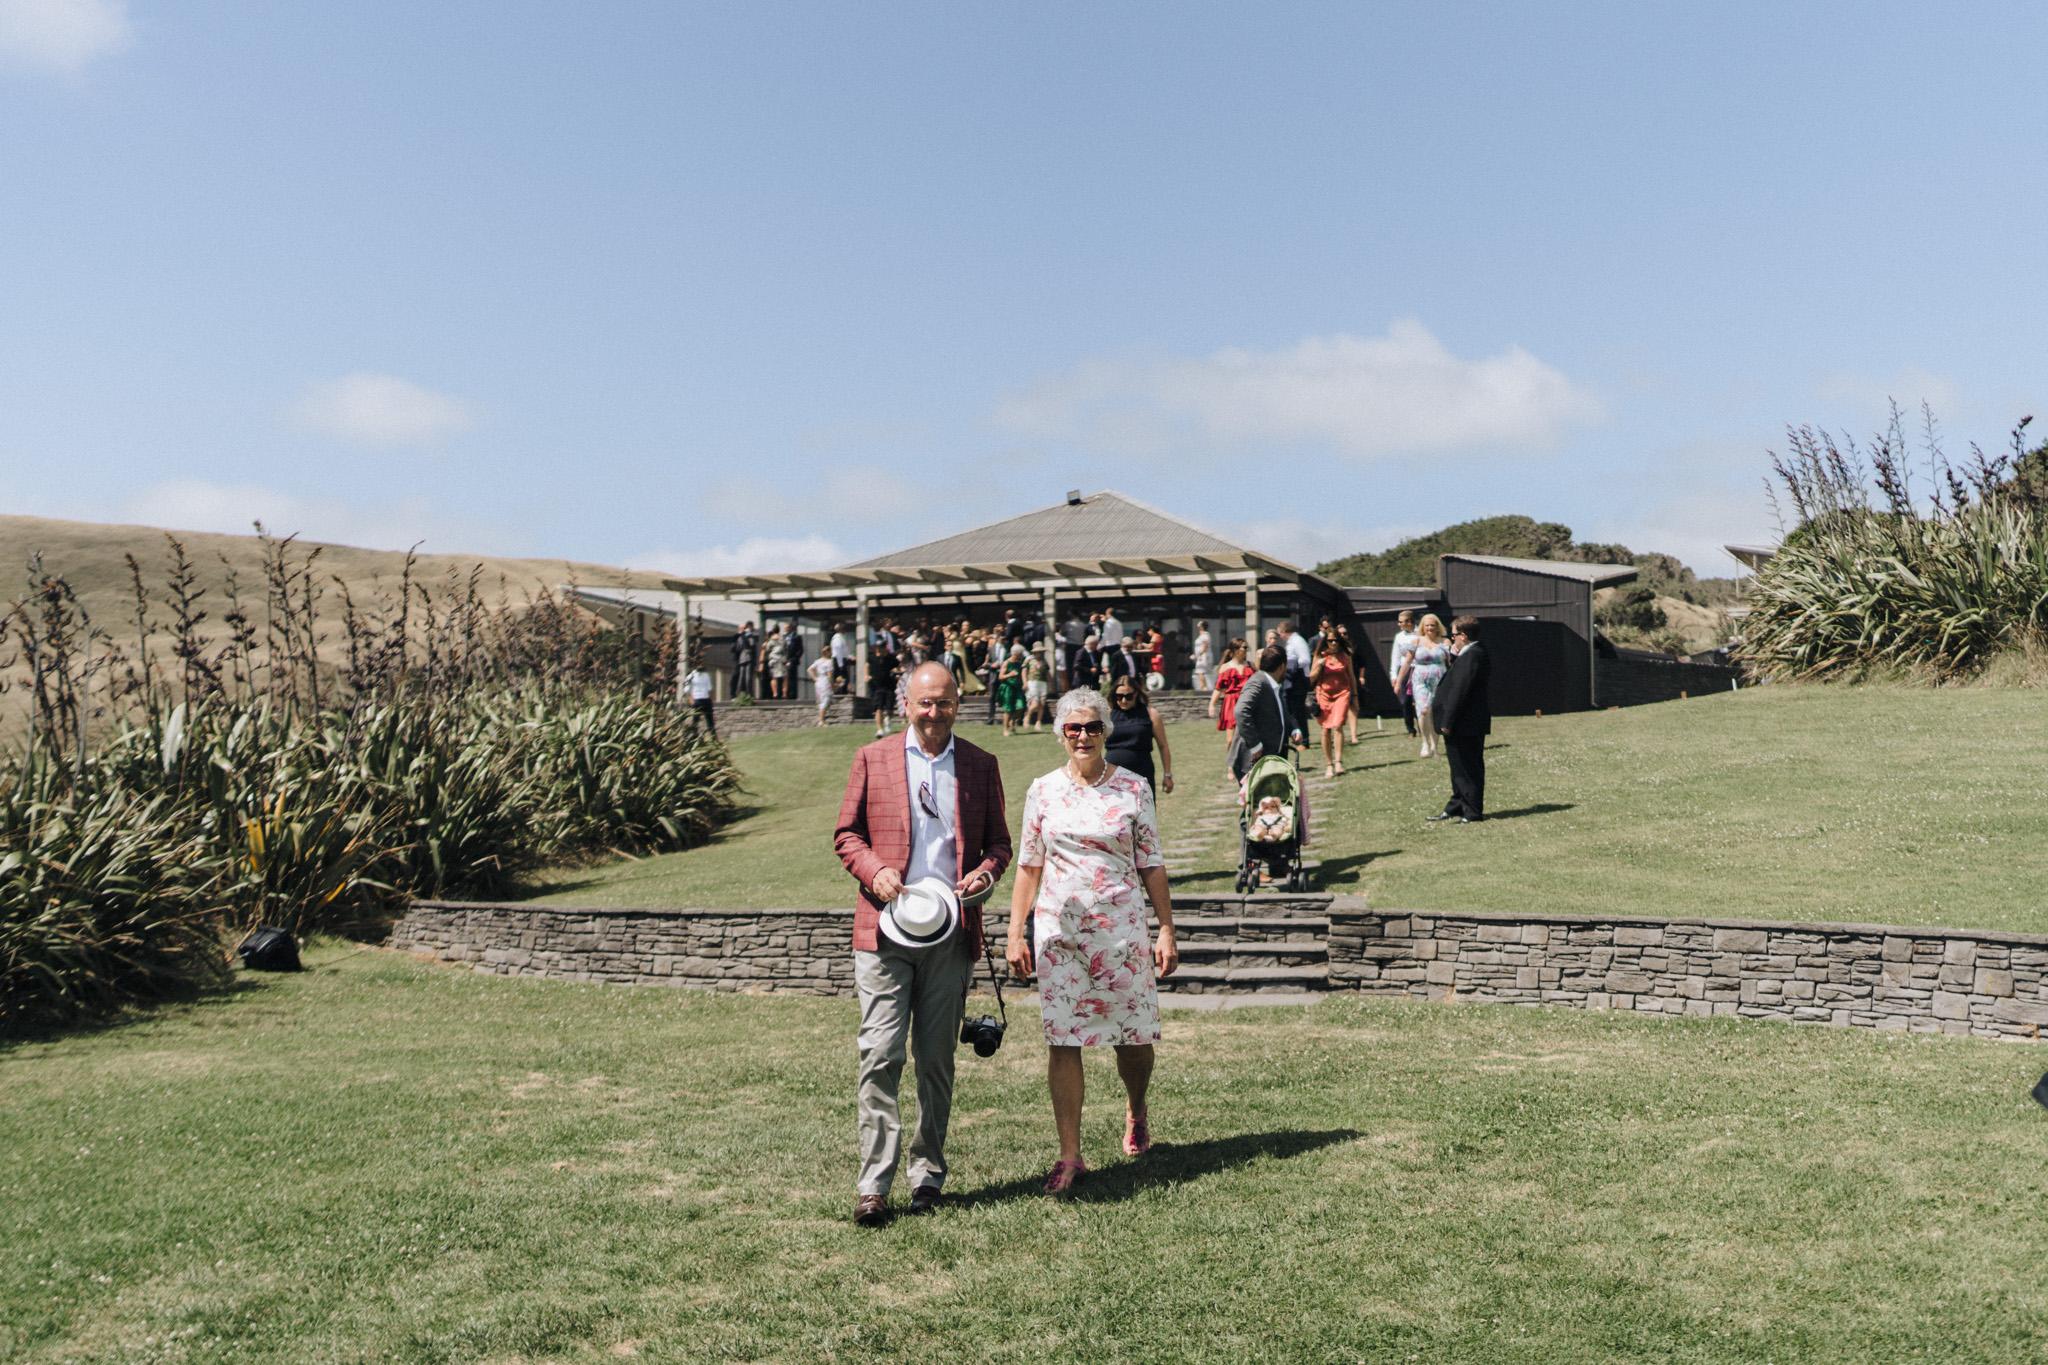 newfound-h-m-castaways-waiuku-auckland-wedding-photographer-108